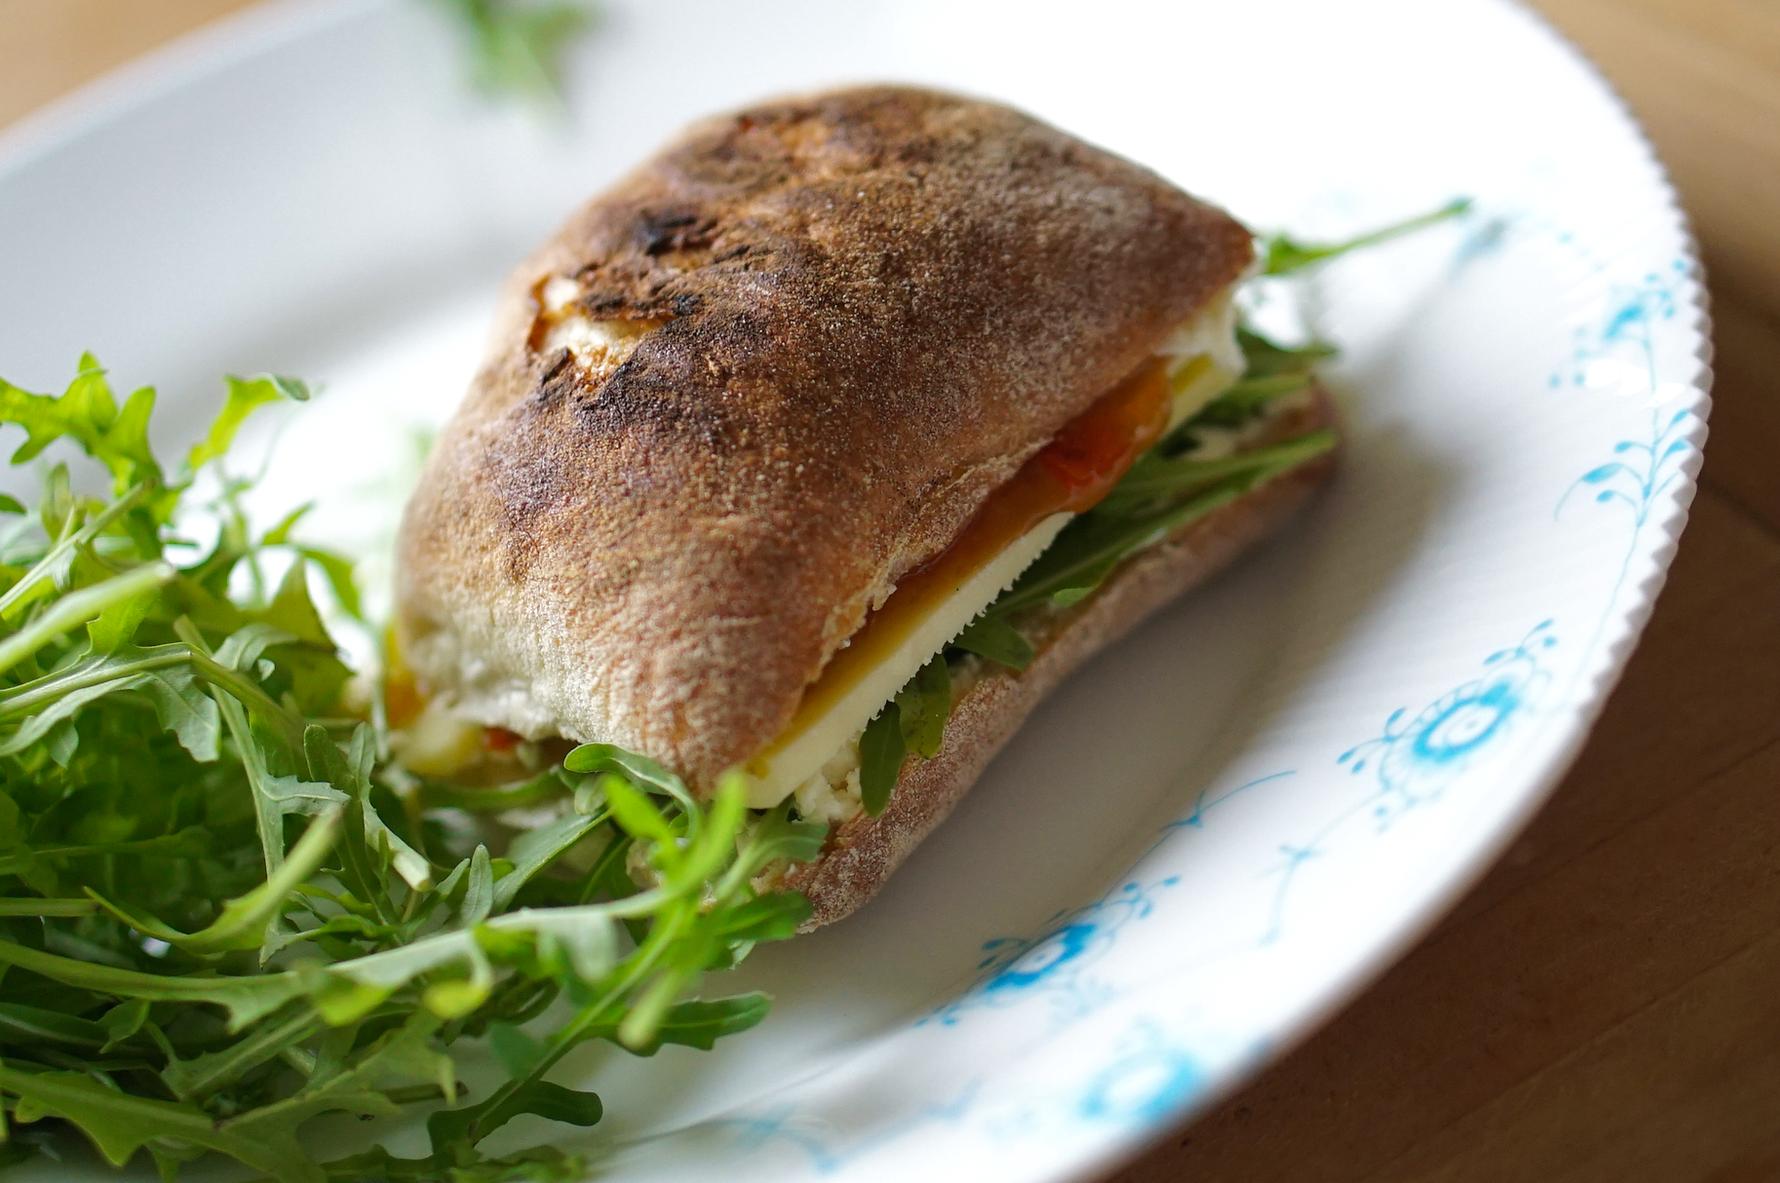 Salty & Sweet Cheese Sandwich